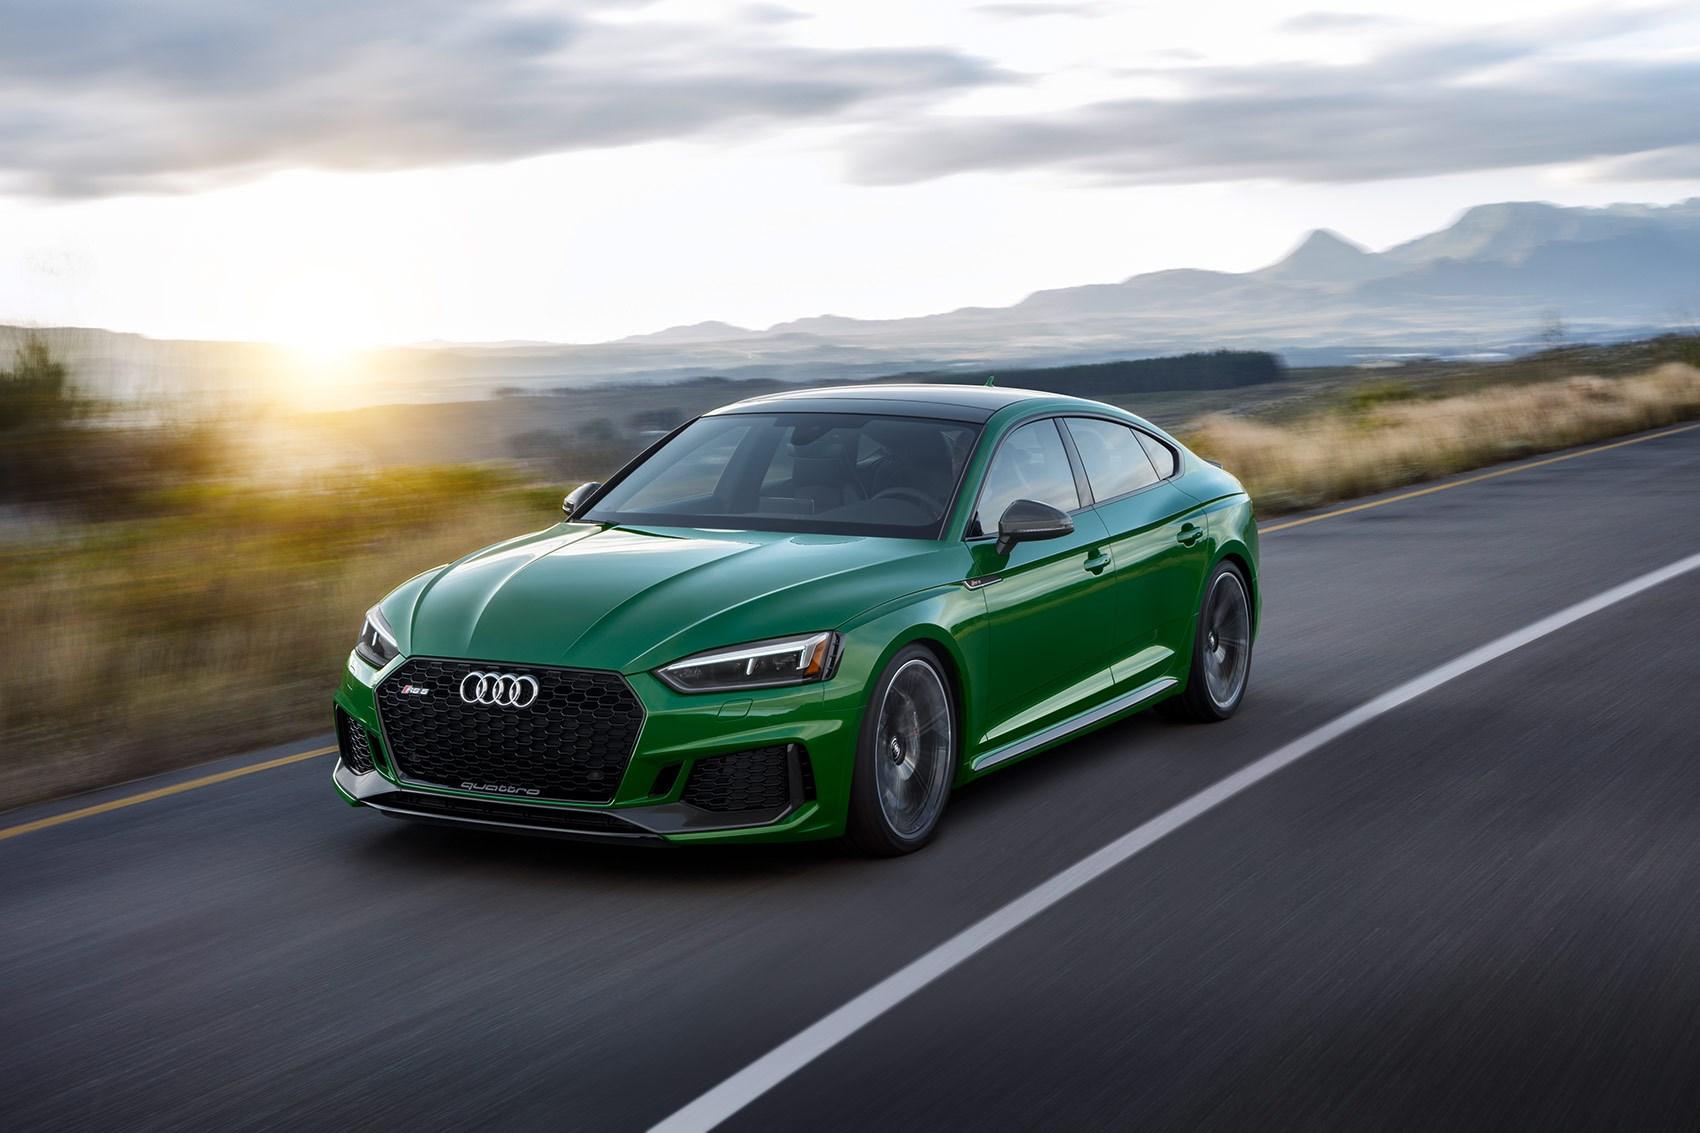 New 2018 Audi RS5 Sportback Revealed